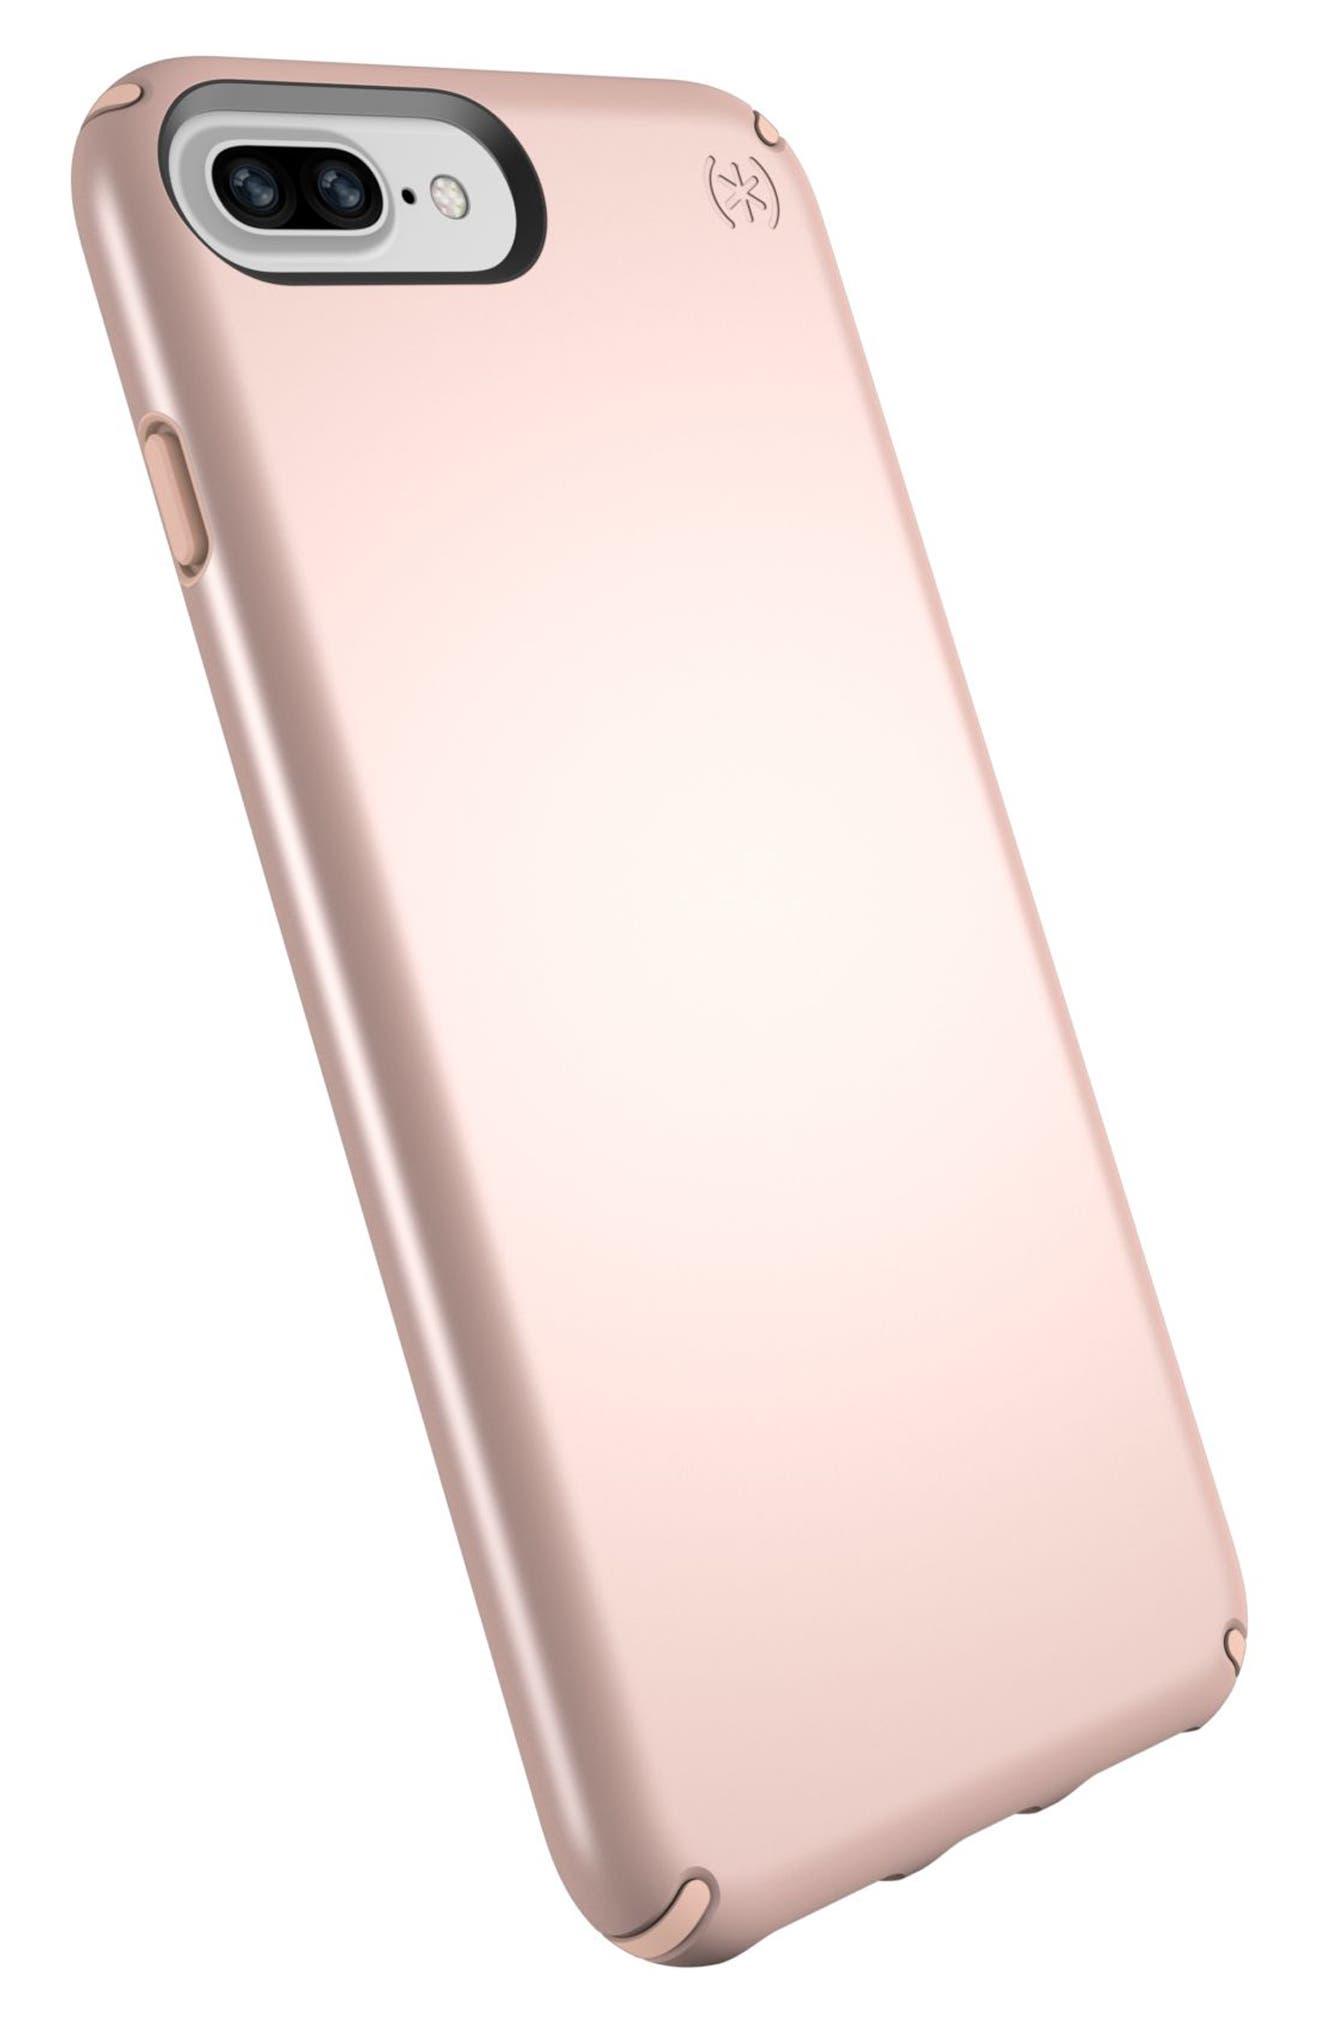 iPhone 6/6s/7/8 Plus Case,                             Alternate thumbnail 7, color,                             Rose Gold Metallic/ Peach